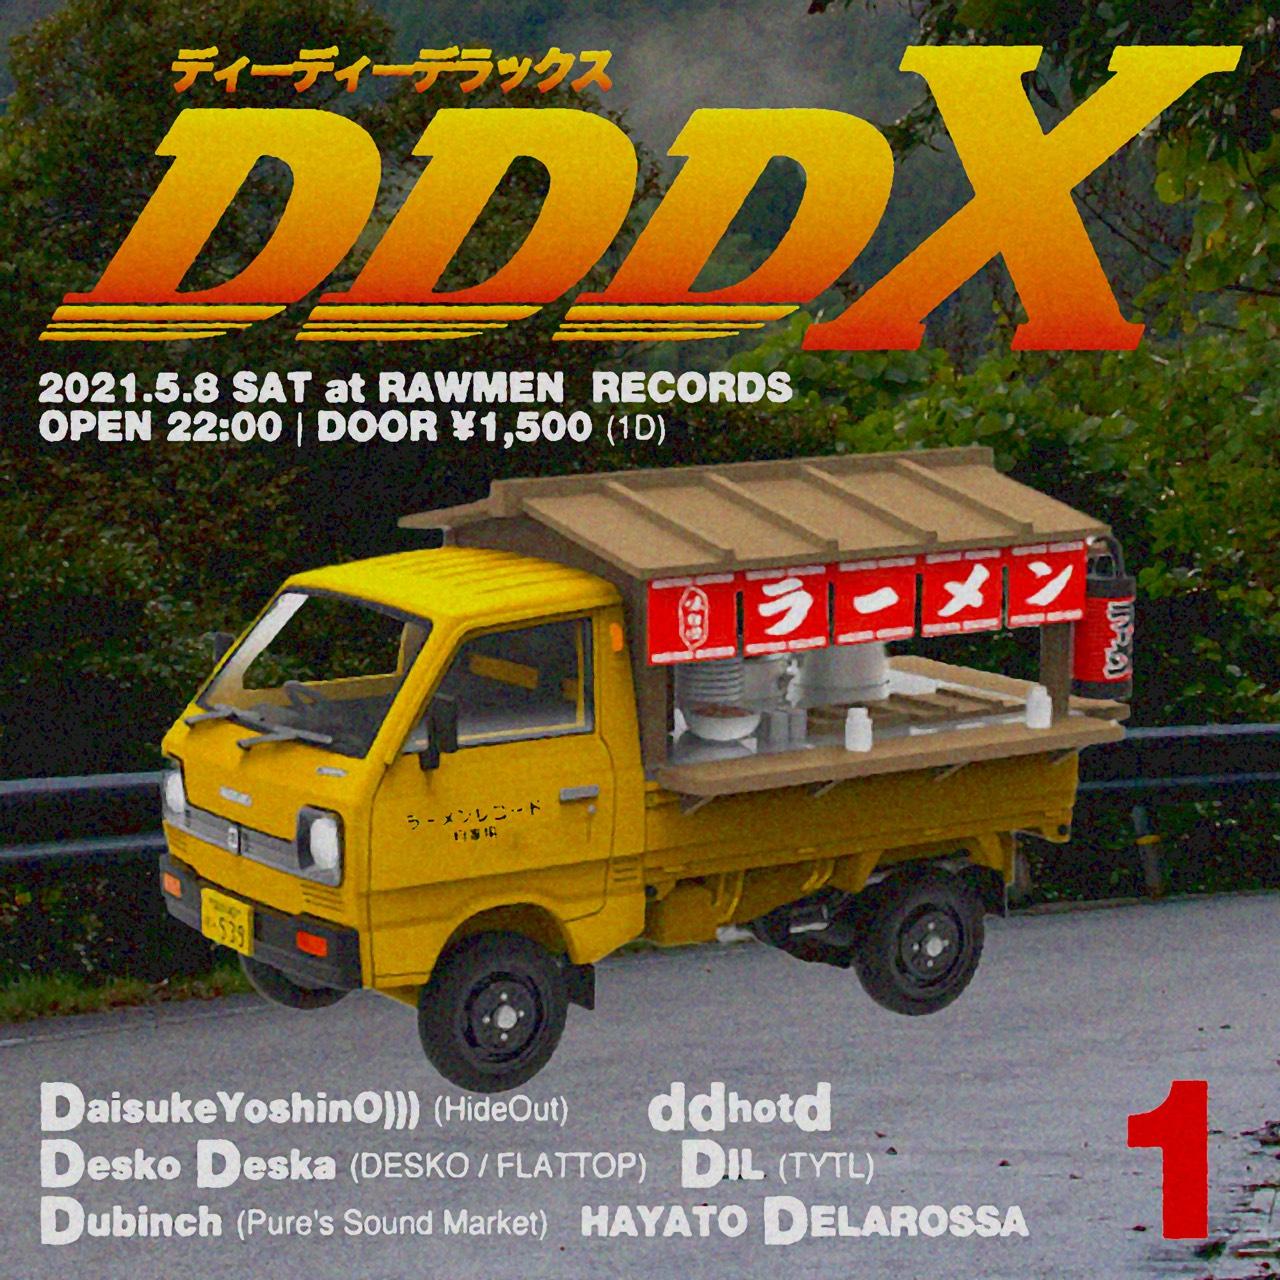 DDDX   5/8 sat. at RAWMEN RECORDS